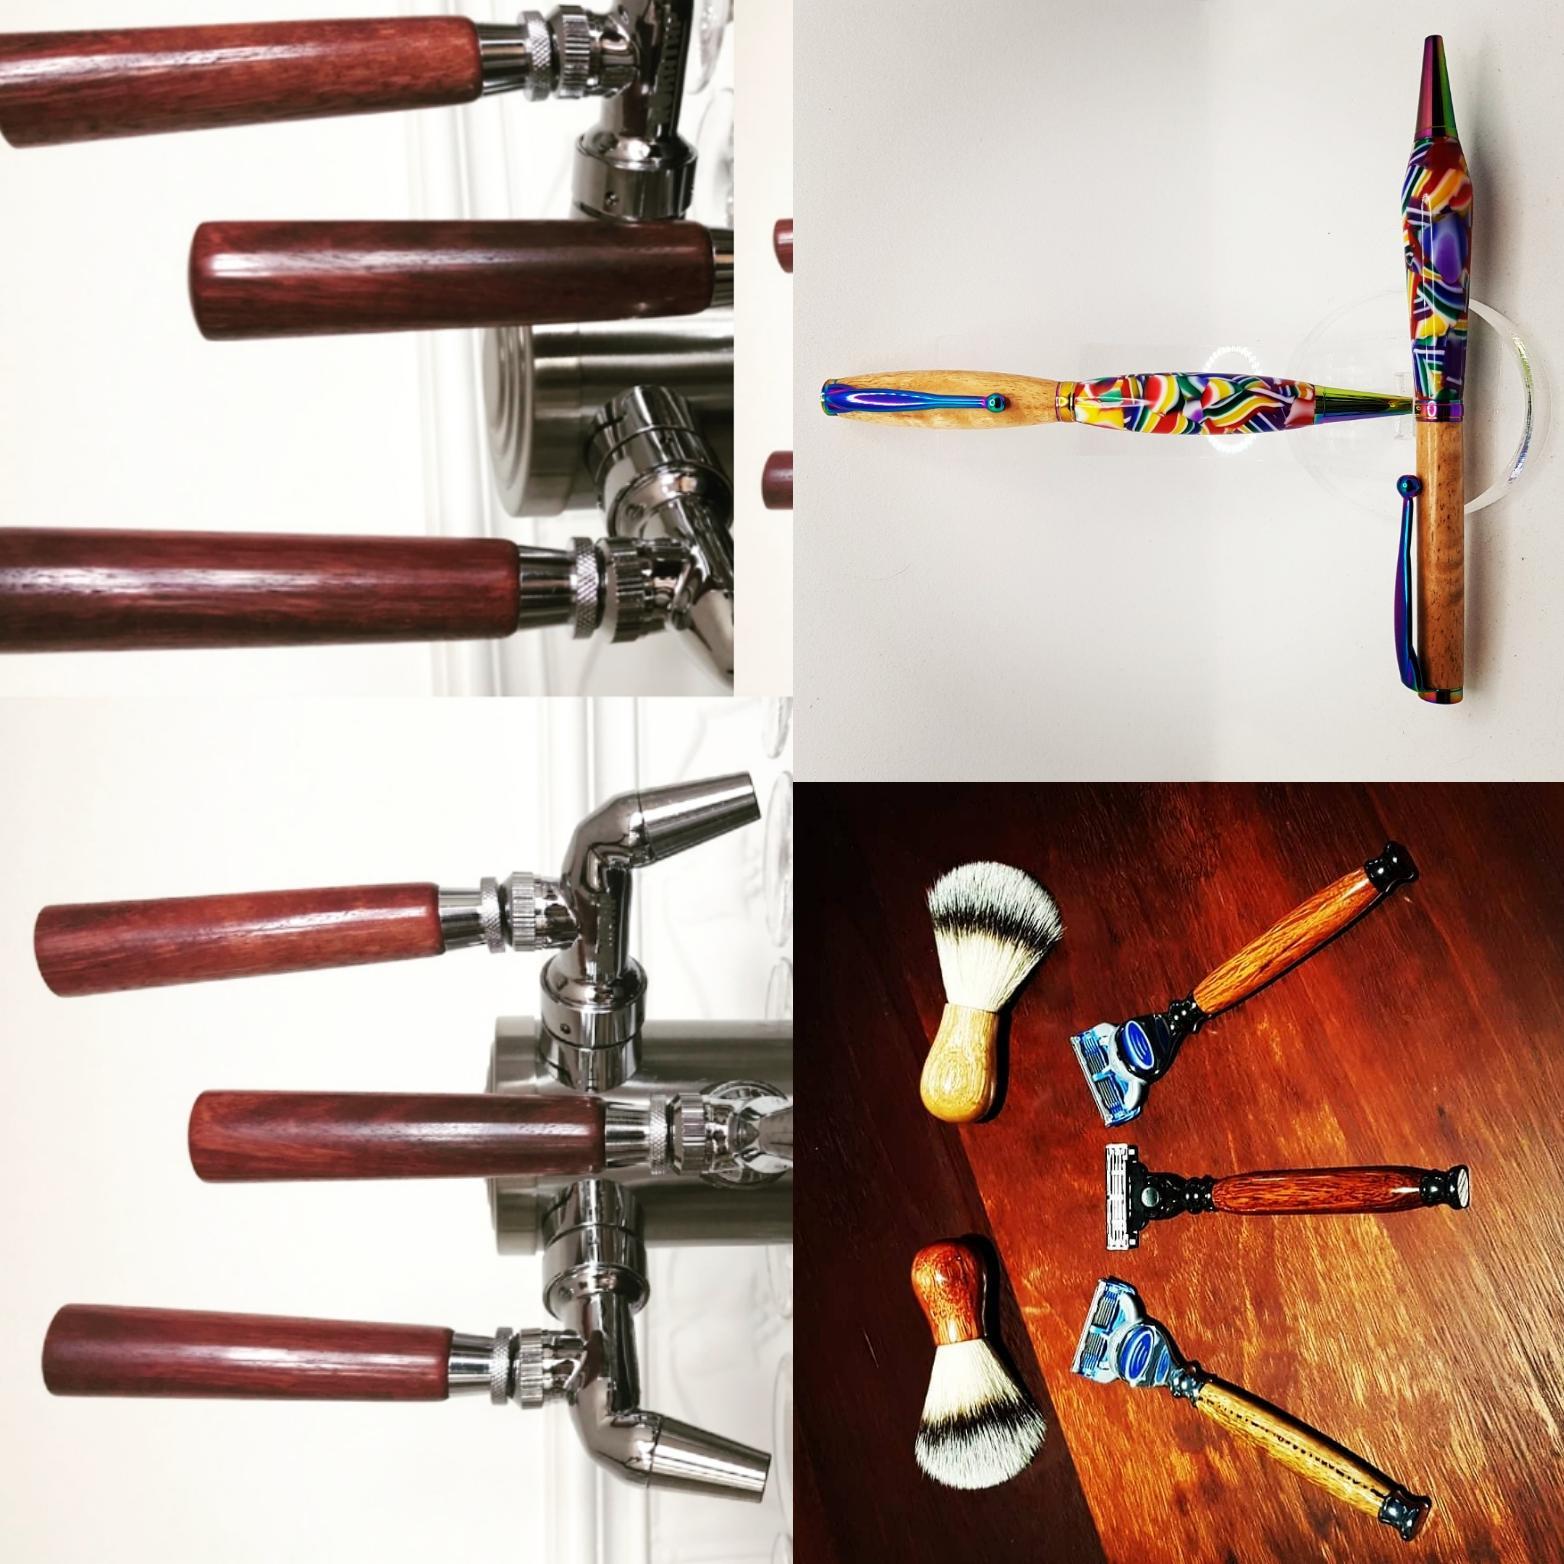 Beer taps, razors, hybrid pens